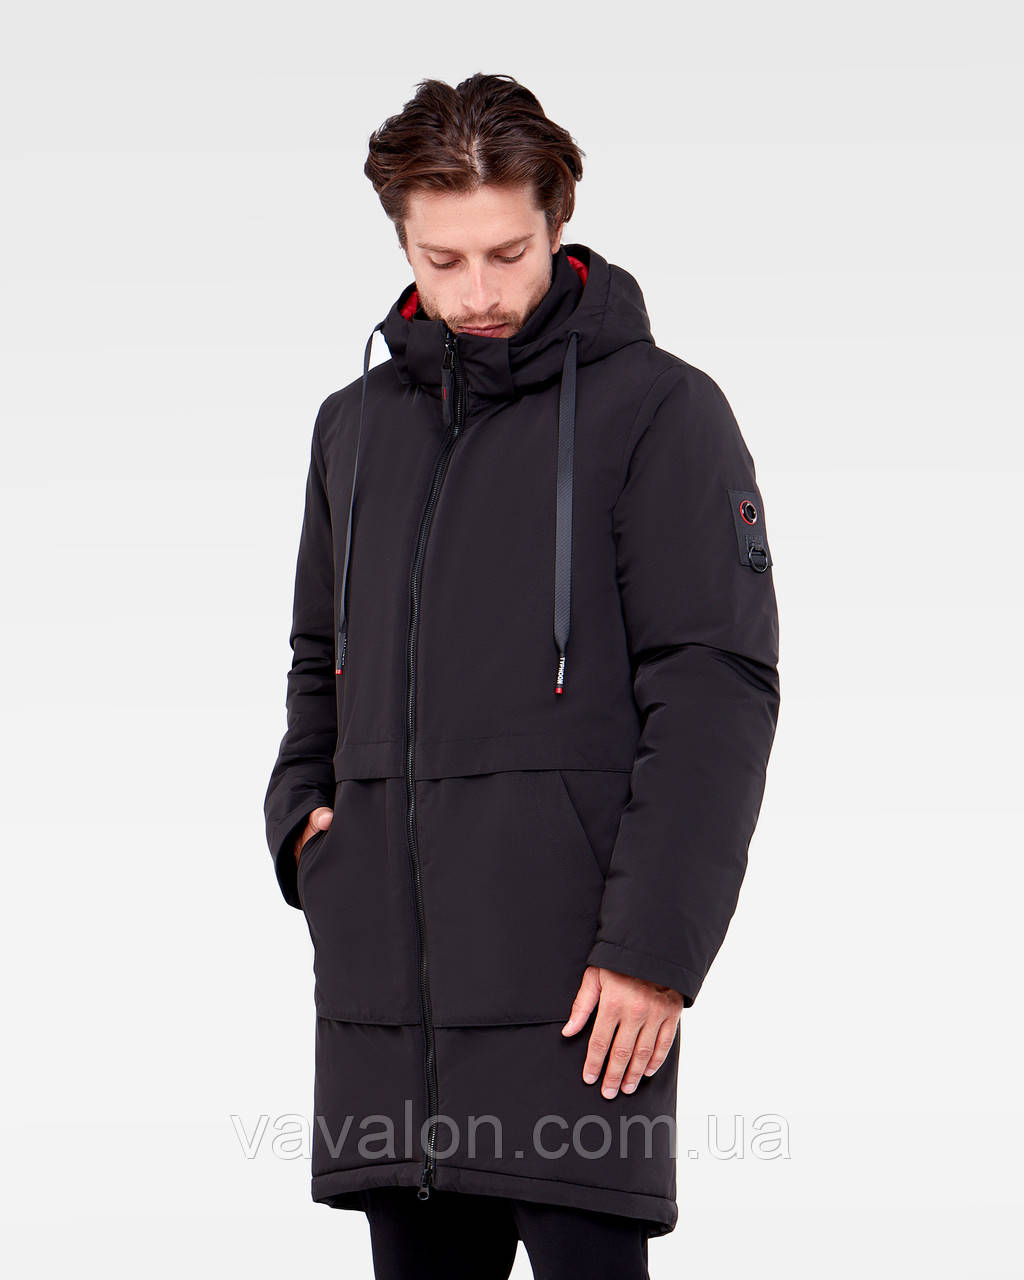 Зимняя мужская куртка Vavalon KZ-P910 black